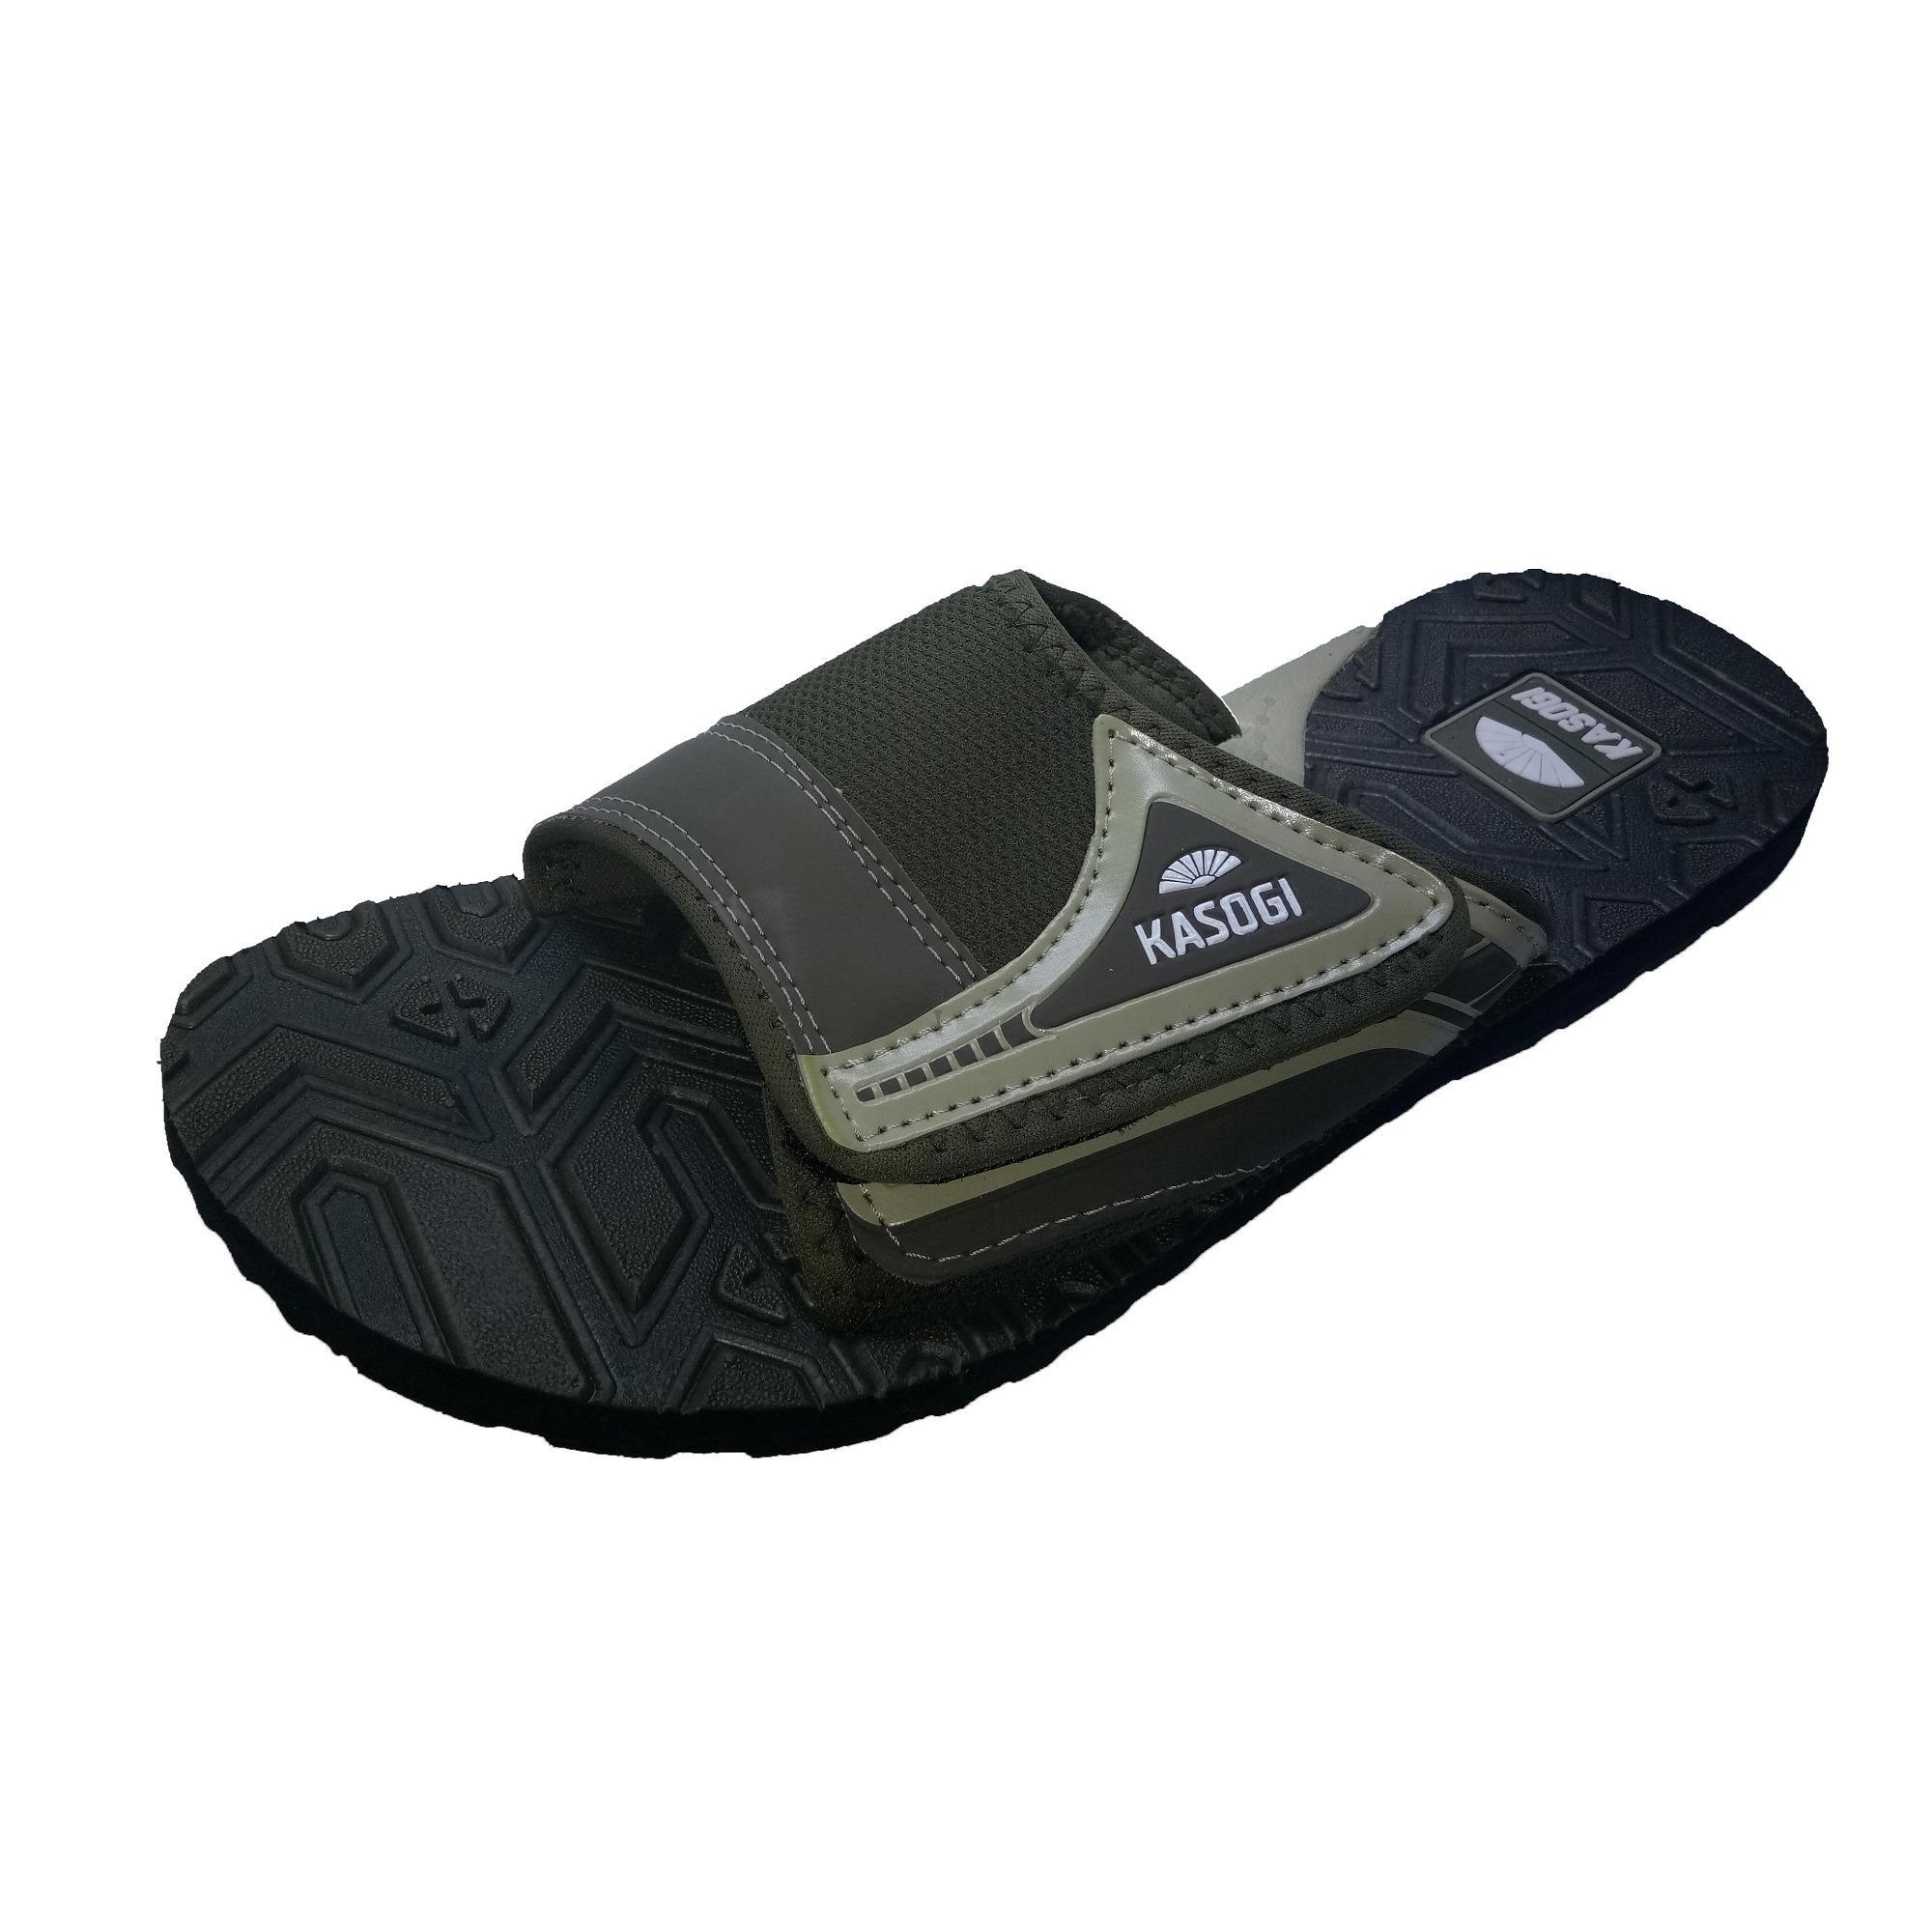 Sandal Kasogi Edward Selop - Sandal Pria - Sandal Wanita - Sandal Anak - Sandal Casual - Sandal Outdoor - Sandal Gunung - Sandal Murah